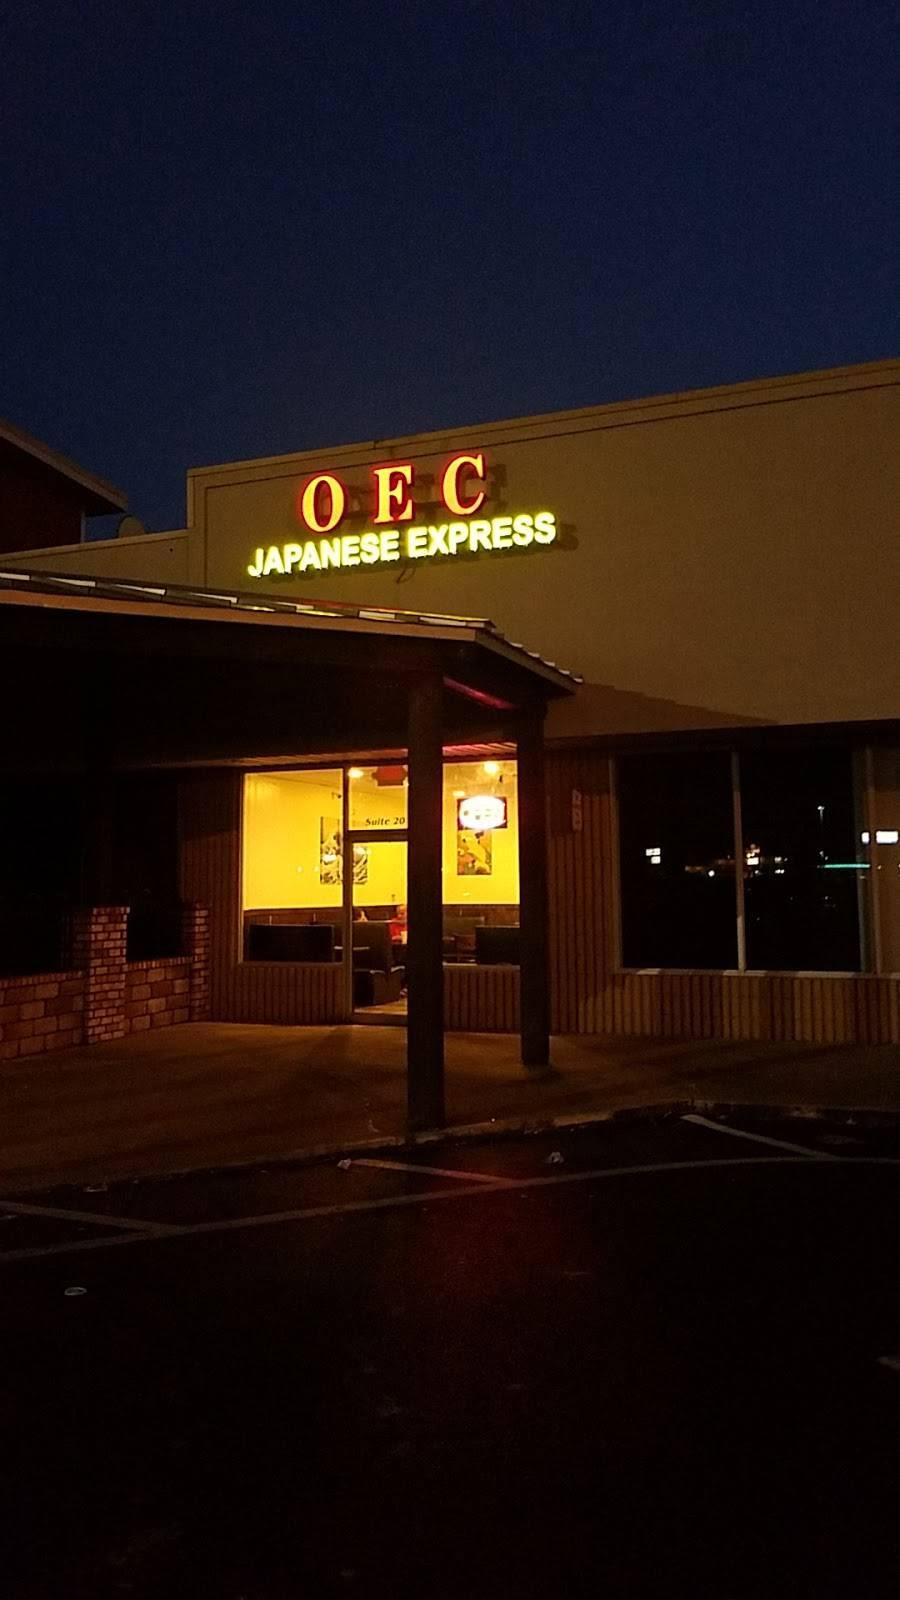 OEC Japanese Express   restaurant   1201 US 49, Richland, MS 39218, USA   6019332488 OR +1 601-933-2488